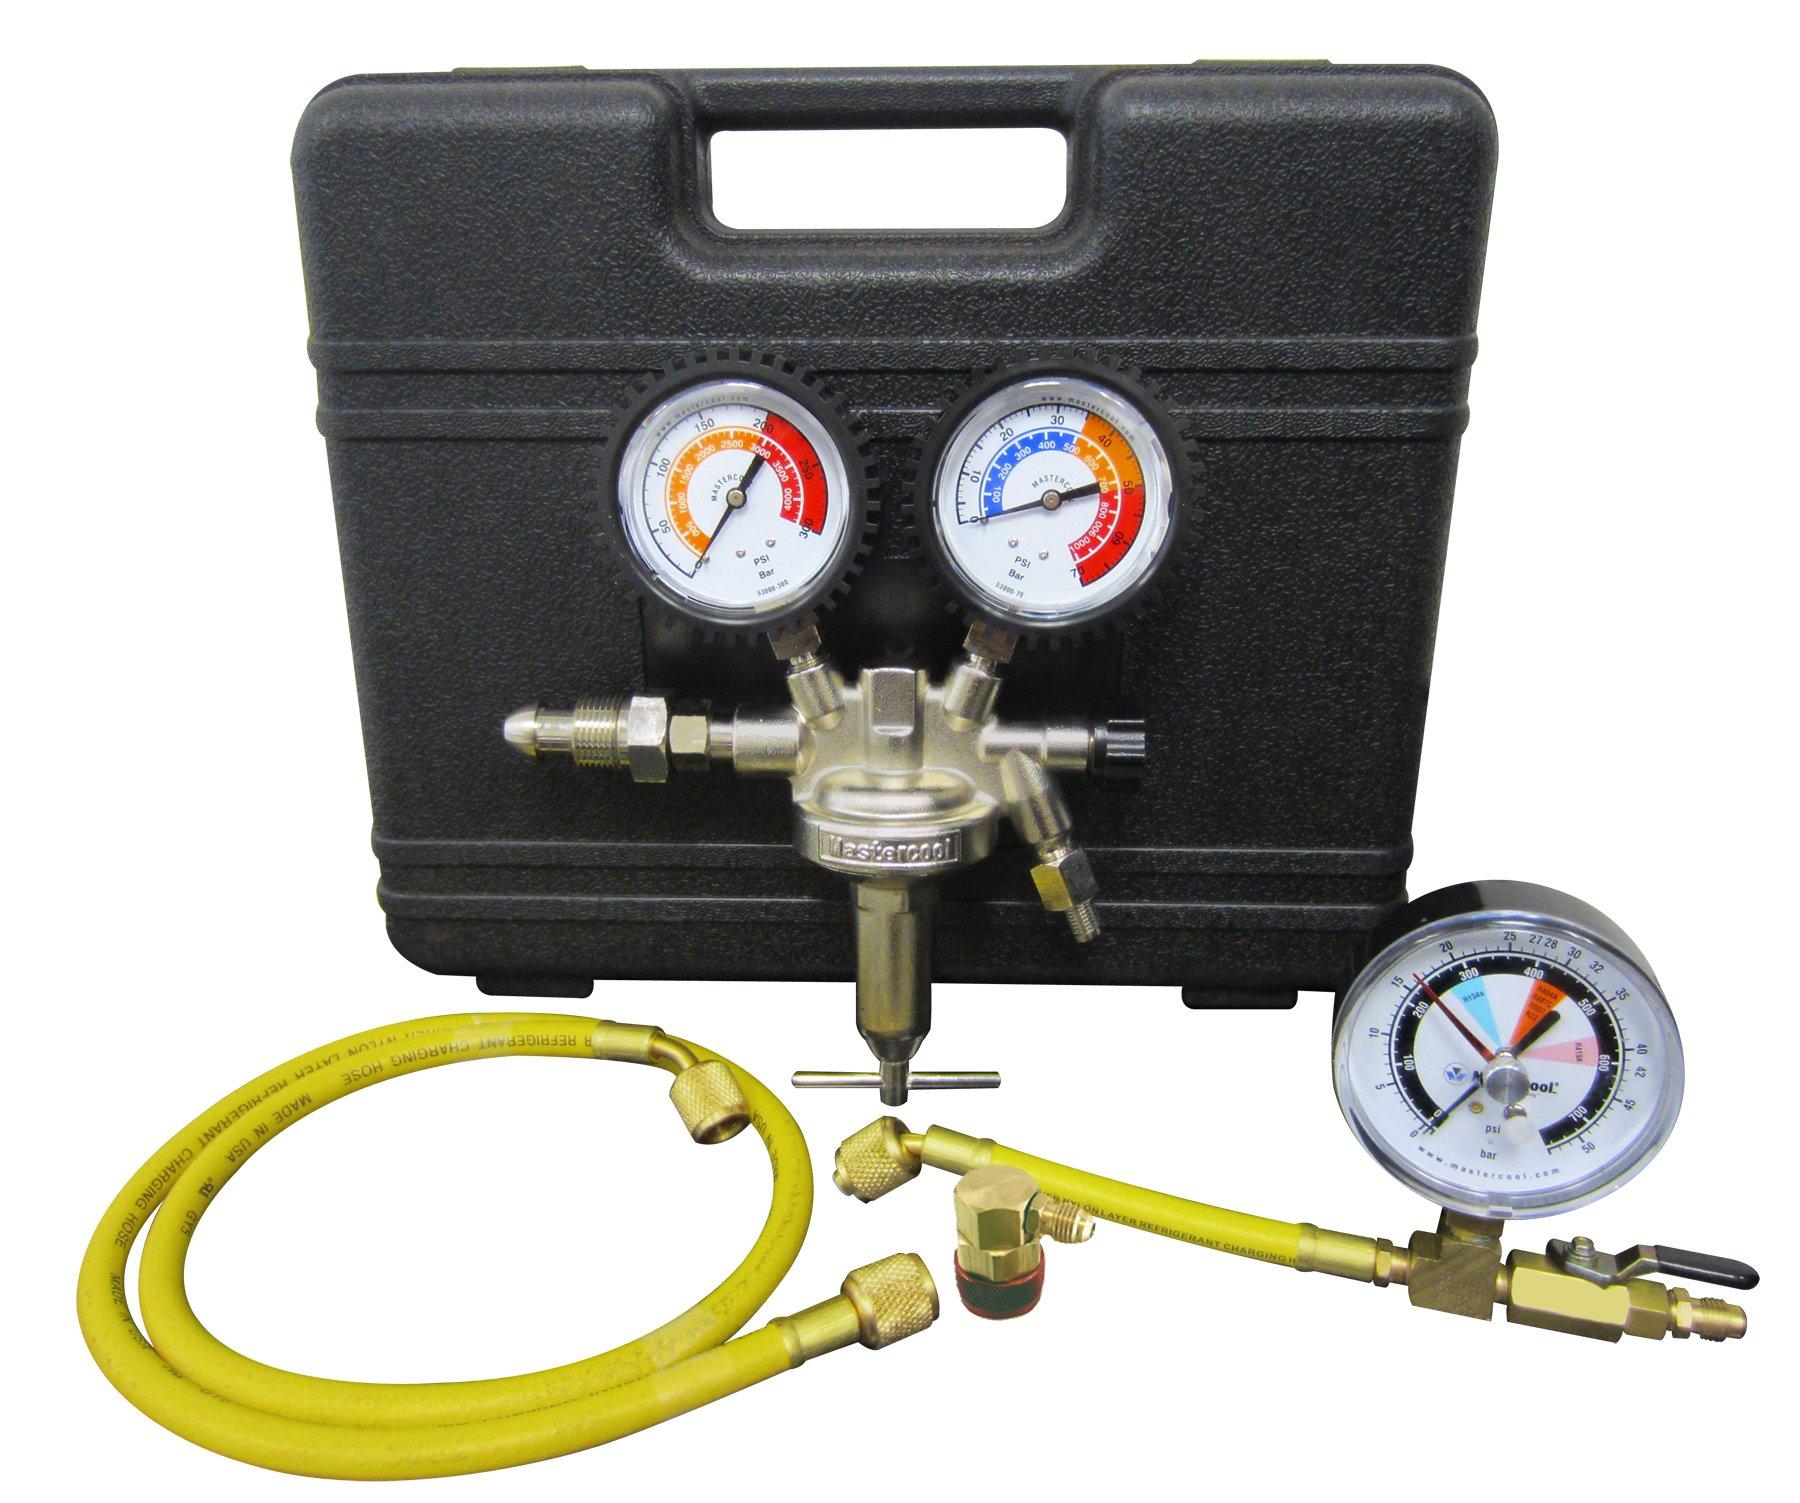 MASTERCOOL (53010-AUT Silver Pressure Test Regulator Kit